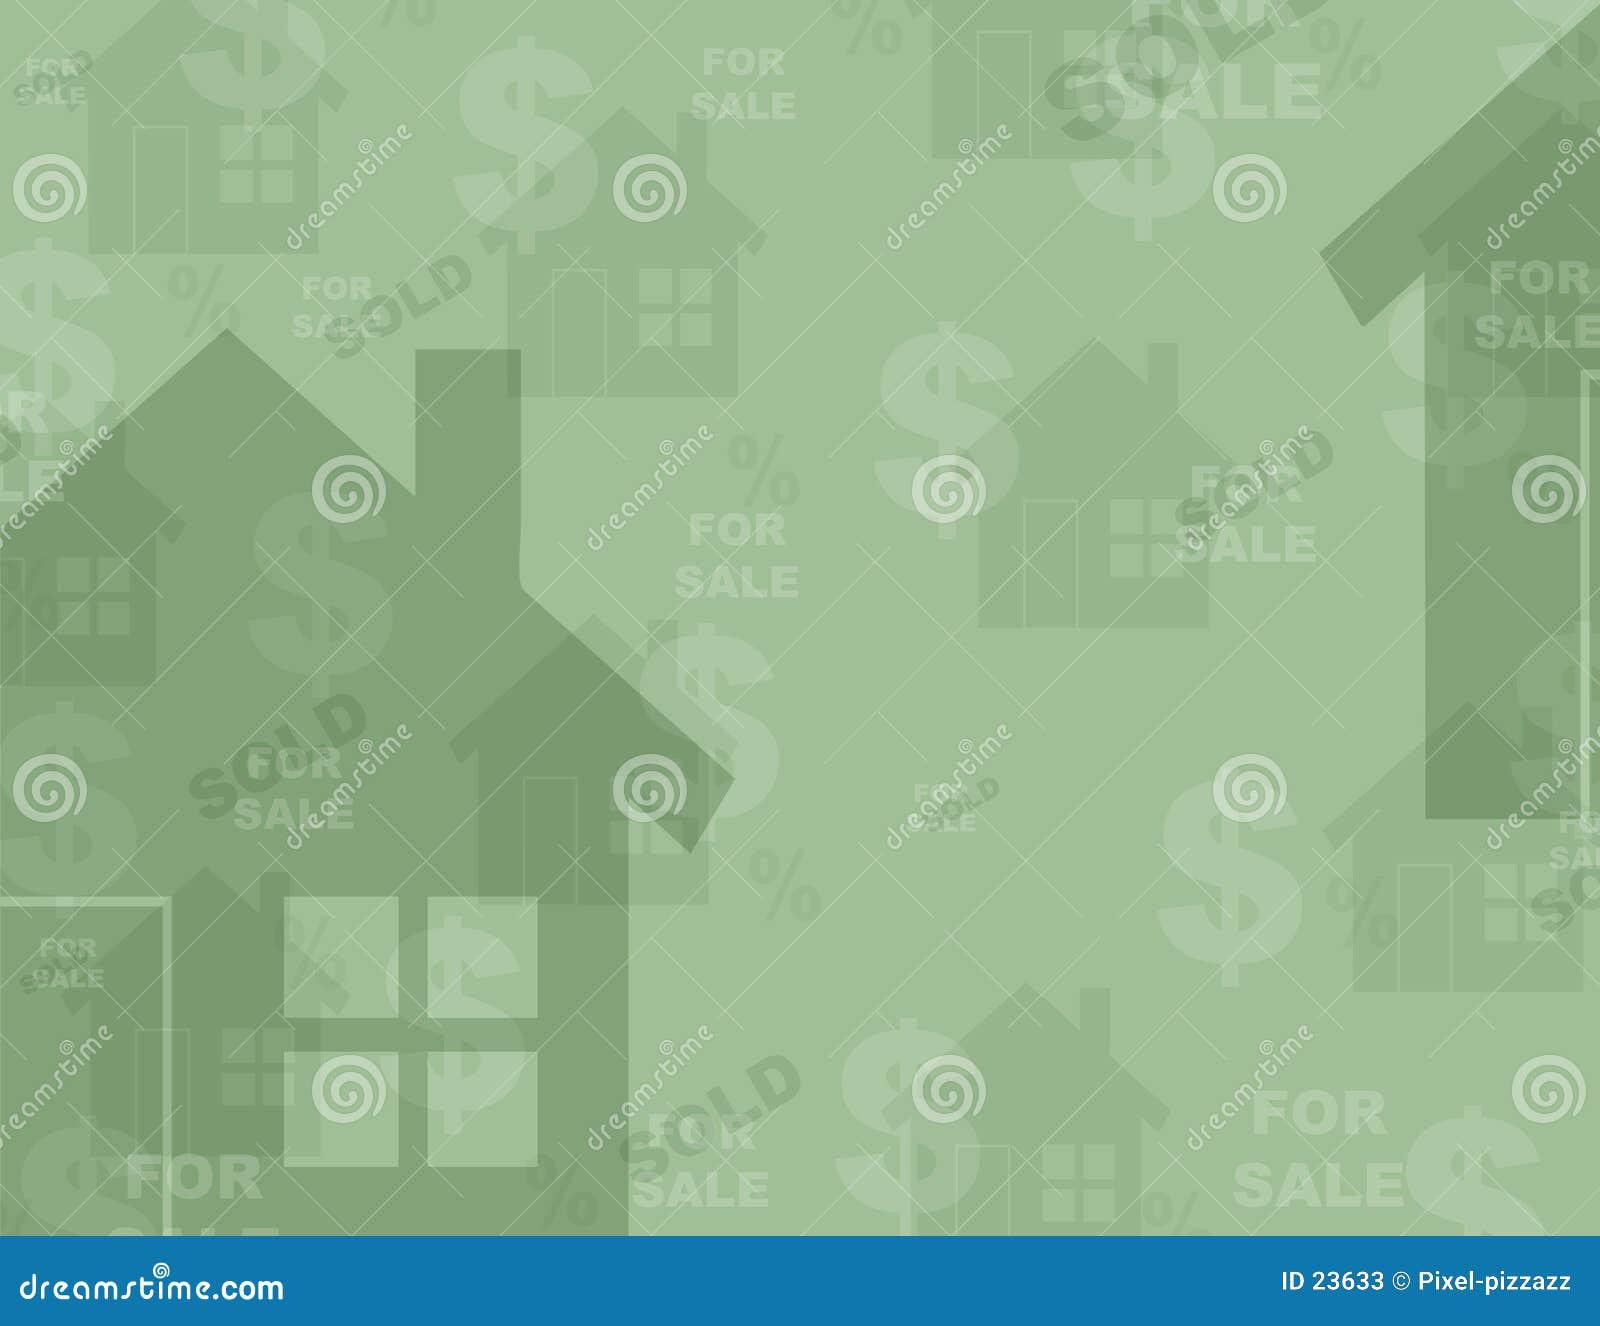 Fondo - propiedades inmobiliarias